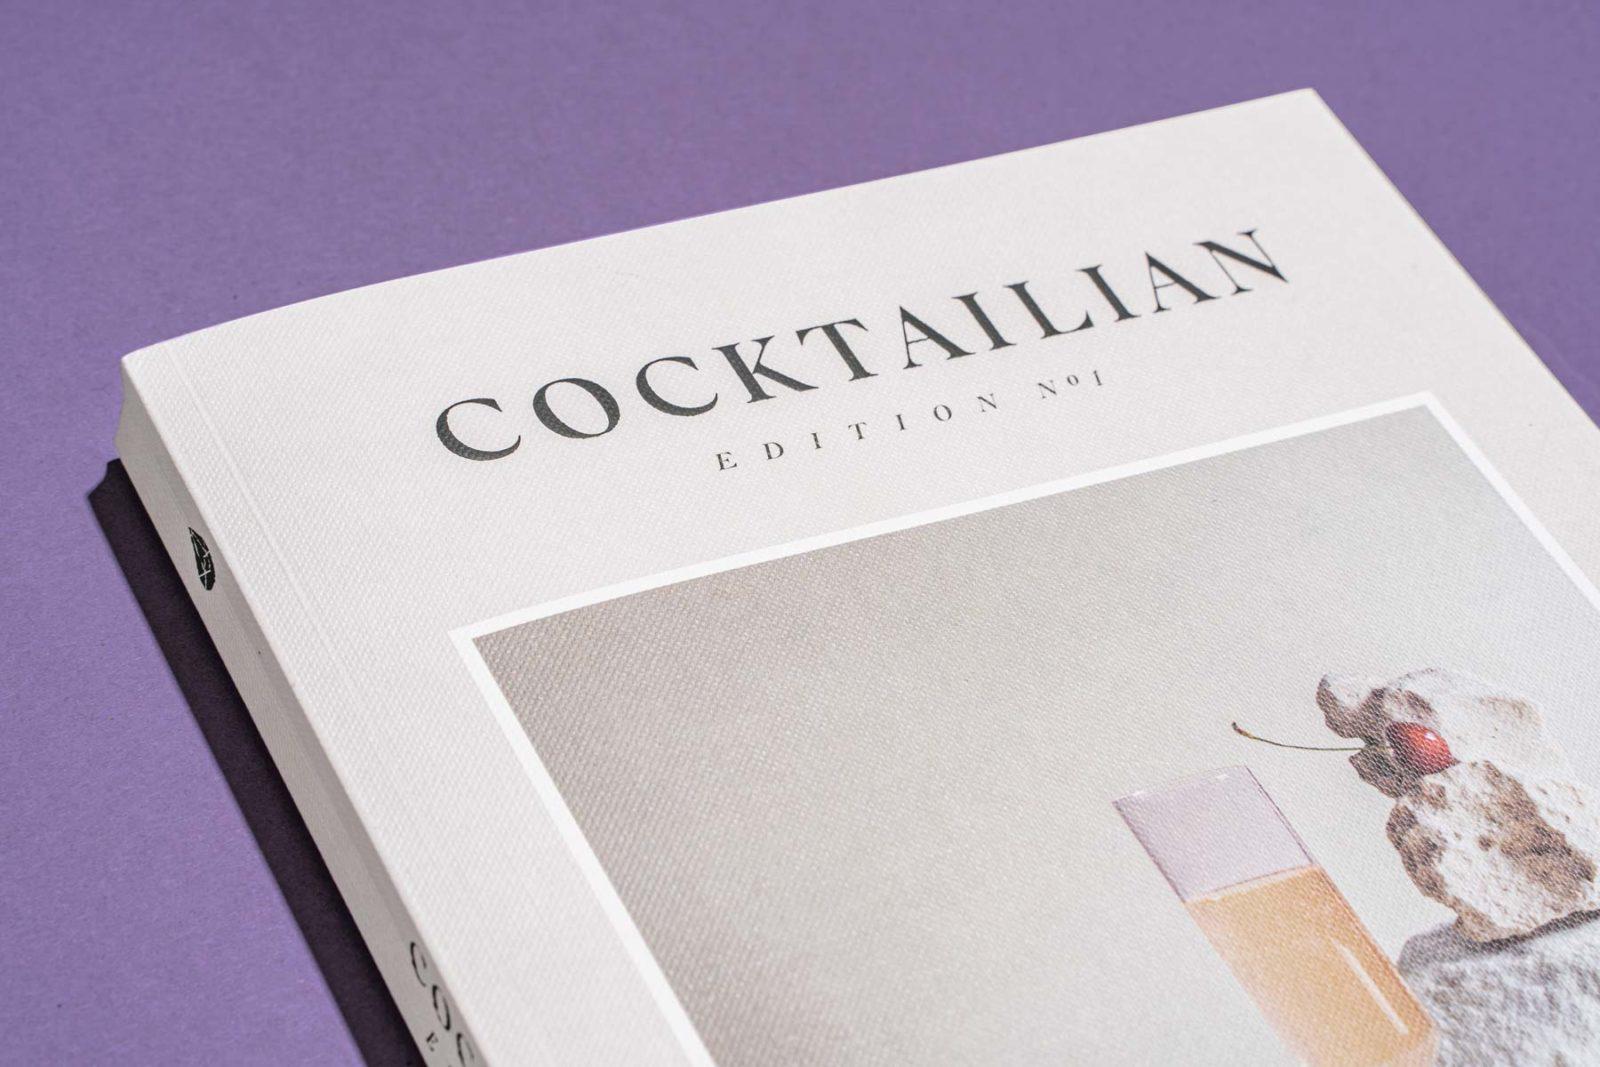 Editorial Design Cocktailian Bookazin